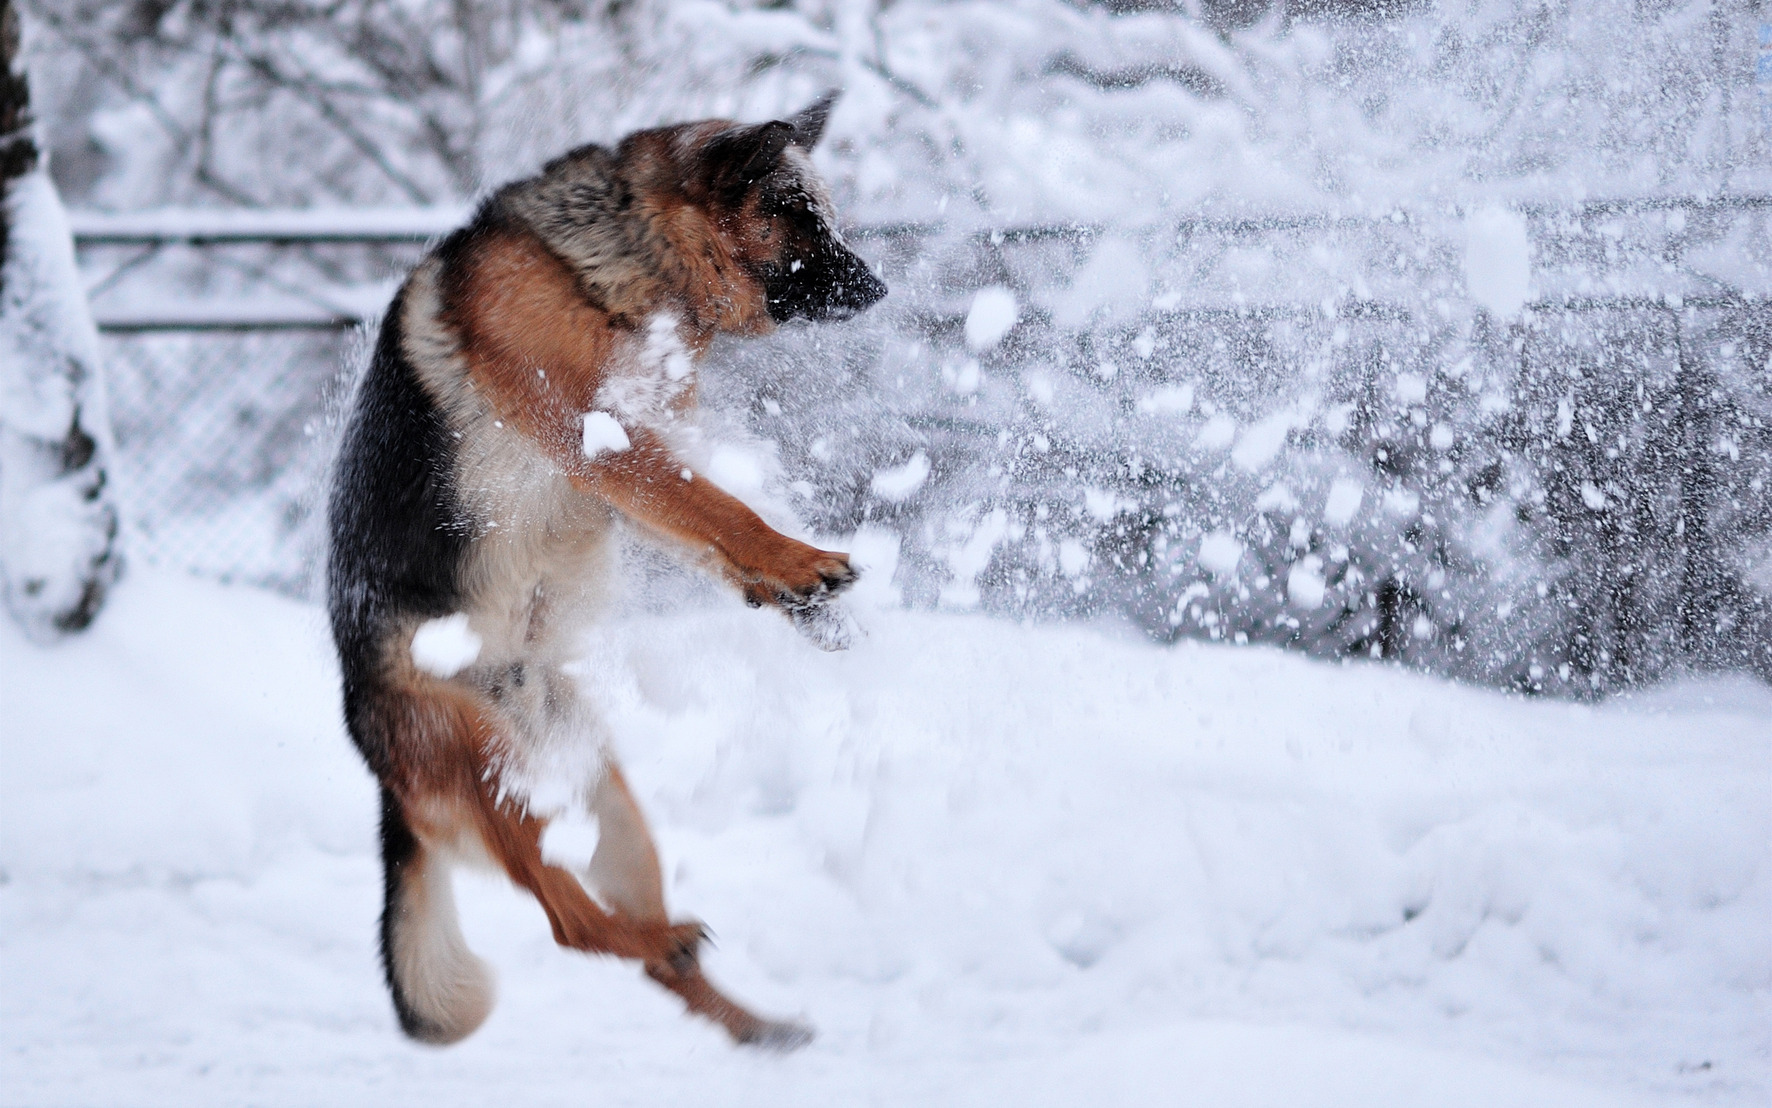 Dog, animal, dog, snow, white, winter